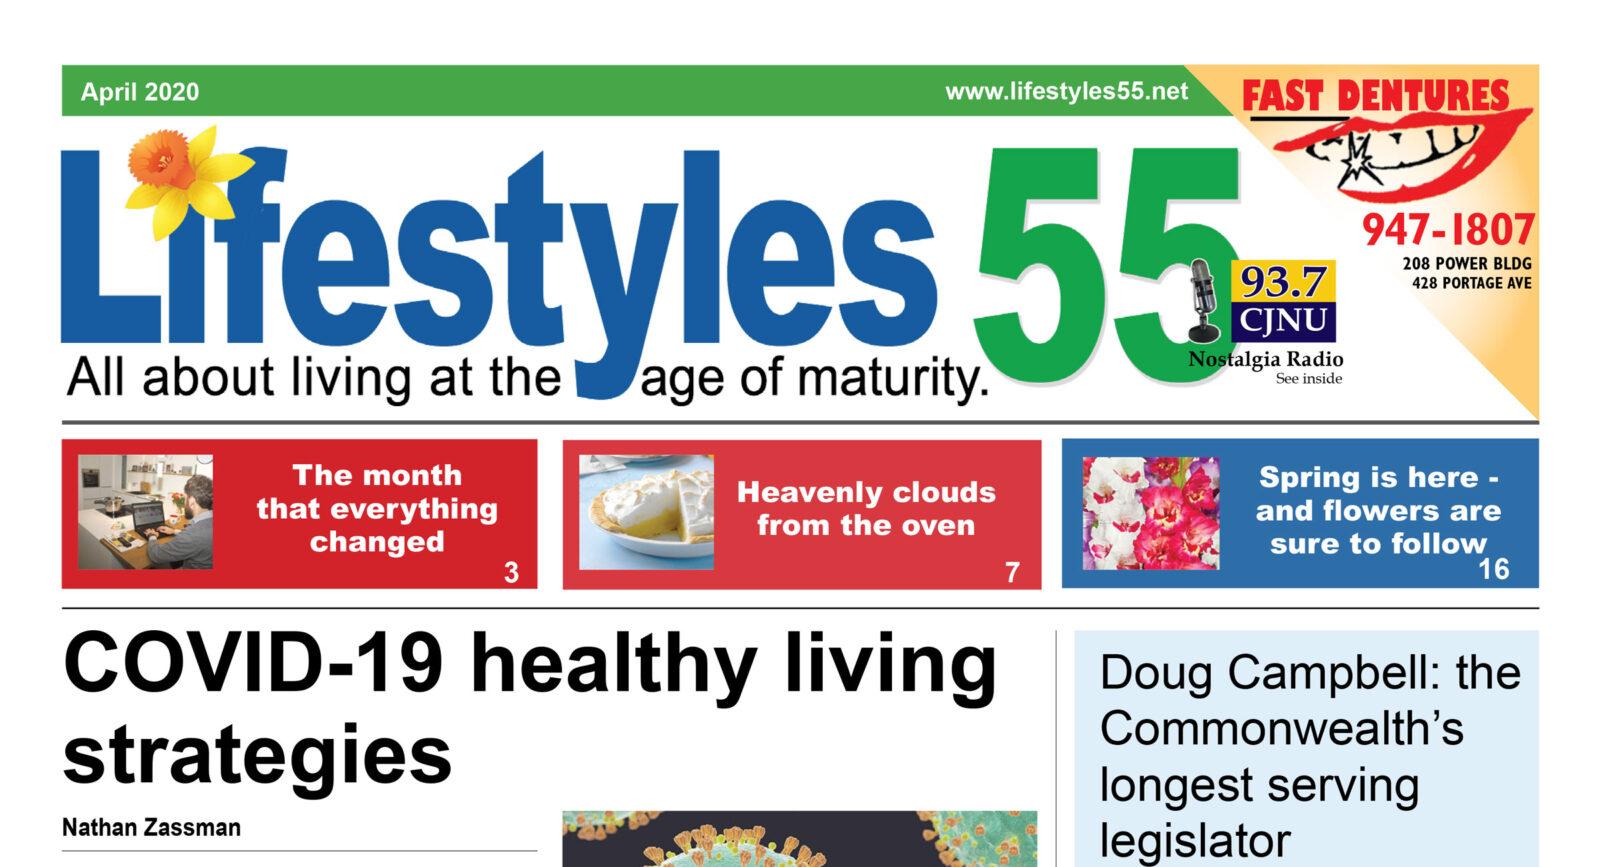 Lifestyles 55 April 2020